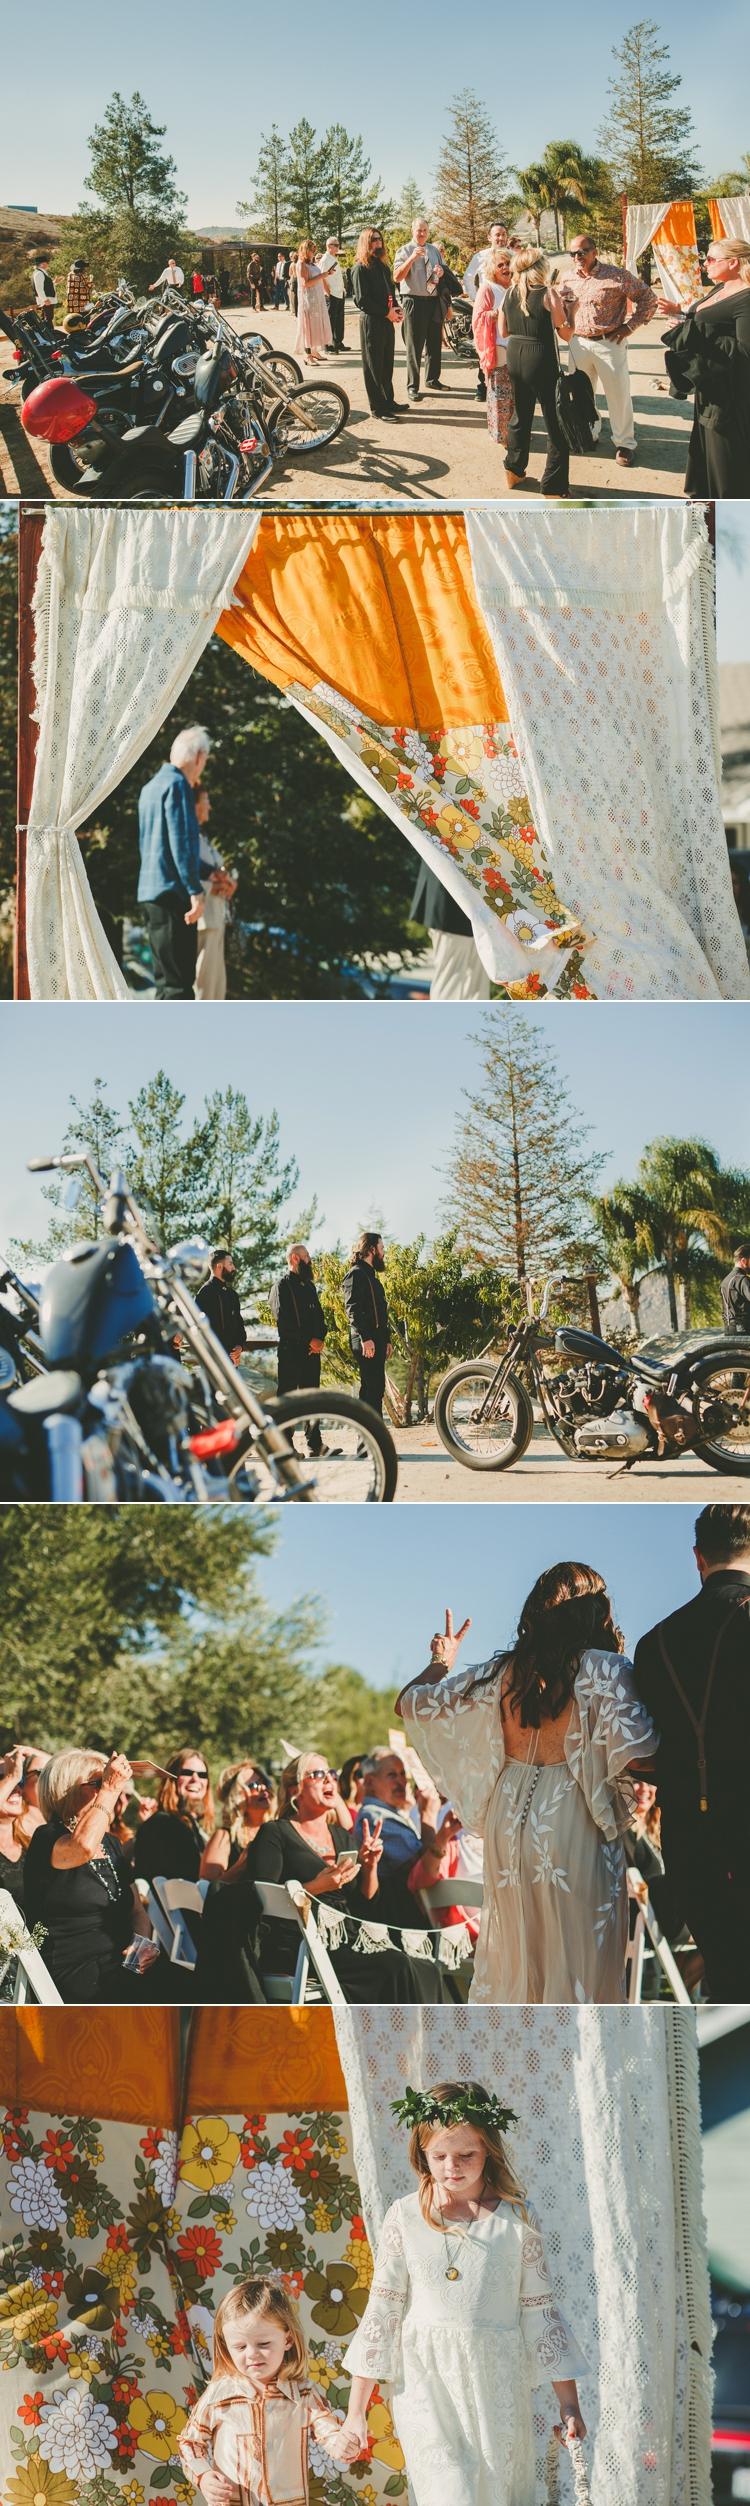 woodstock-inspired-wedding-photos-11